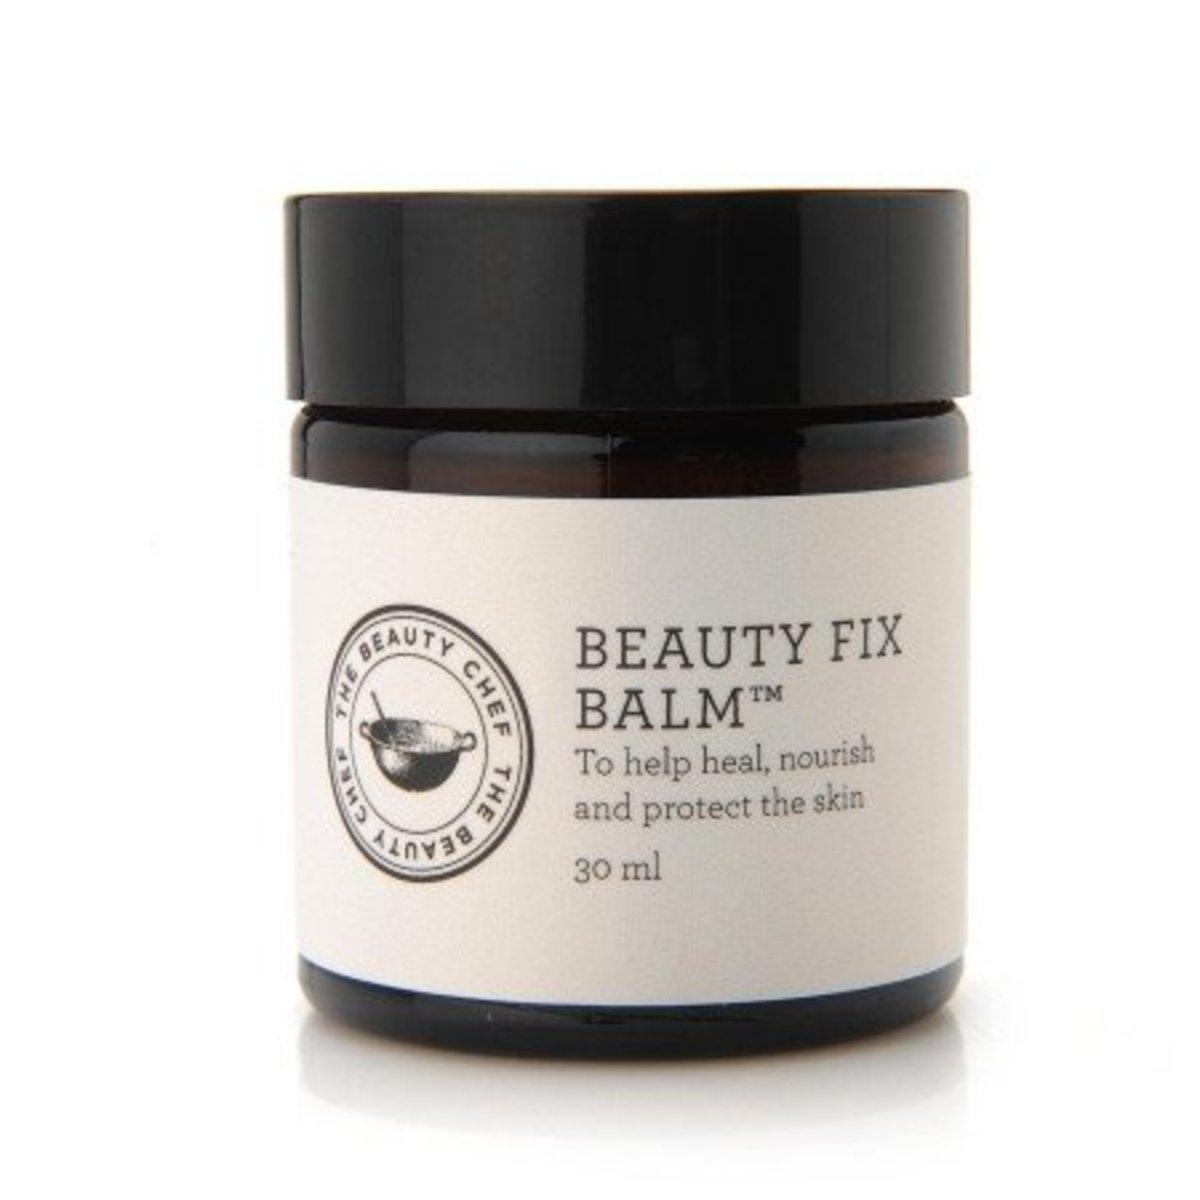 Beauty FIx Balm, The Beauty Chef